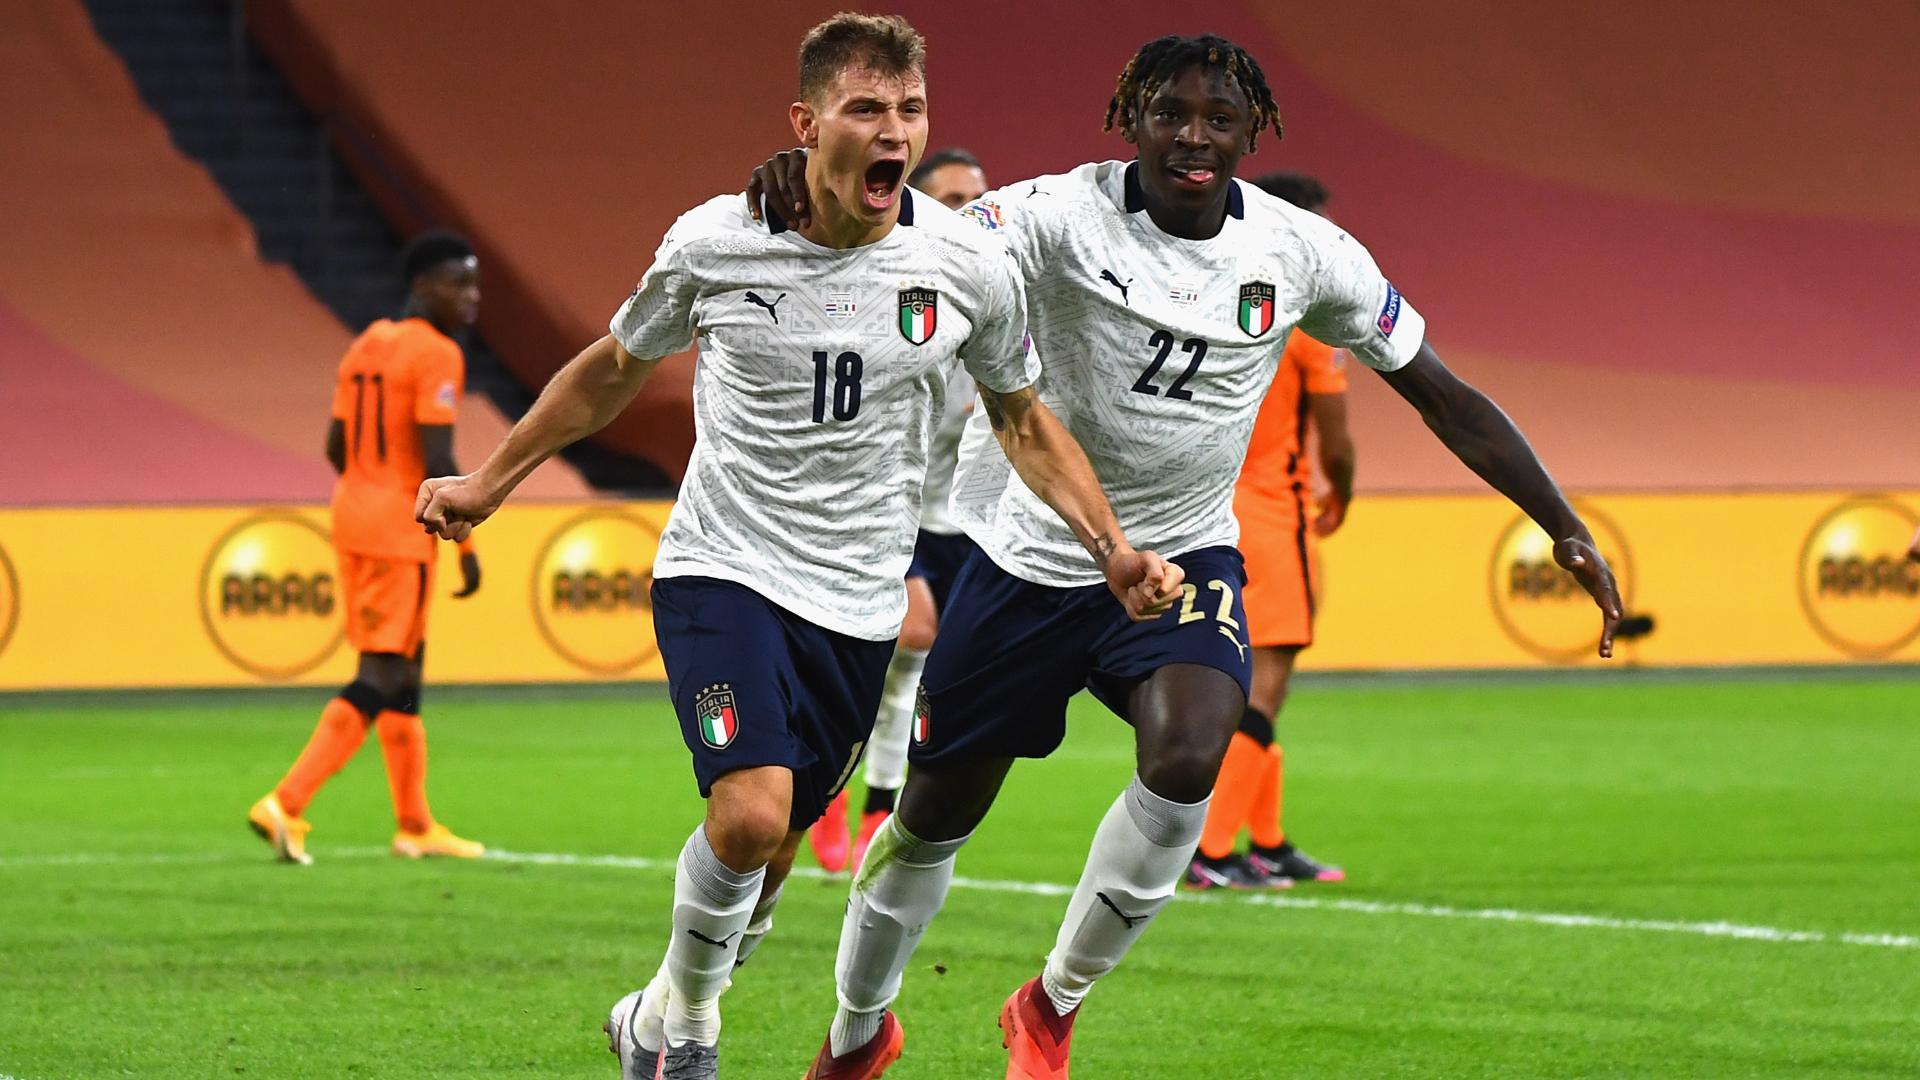 Netherlands 0-1 Italy: Barella sends Azzurri top of Group A1